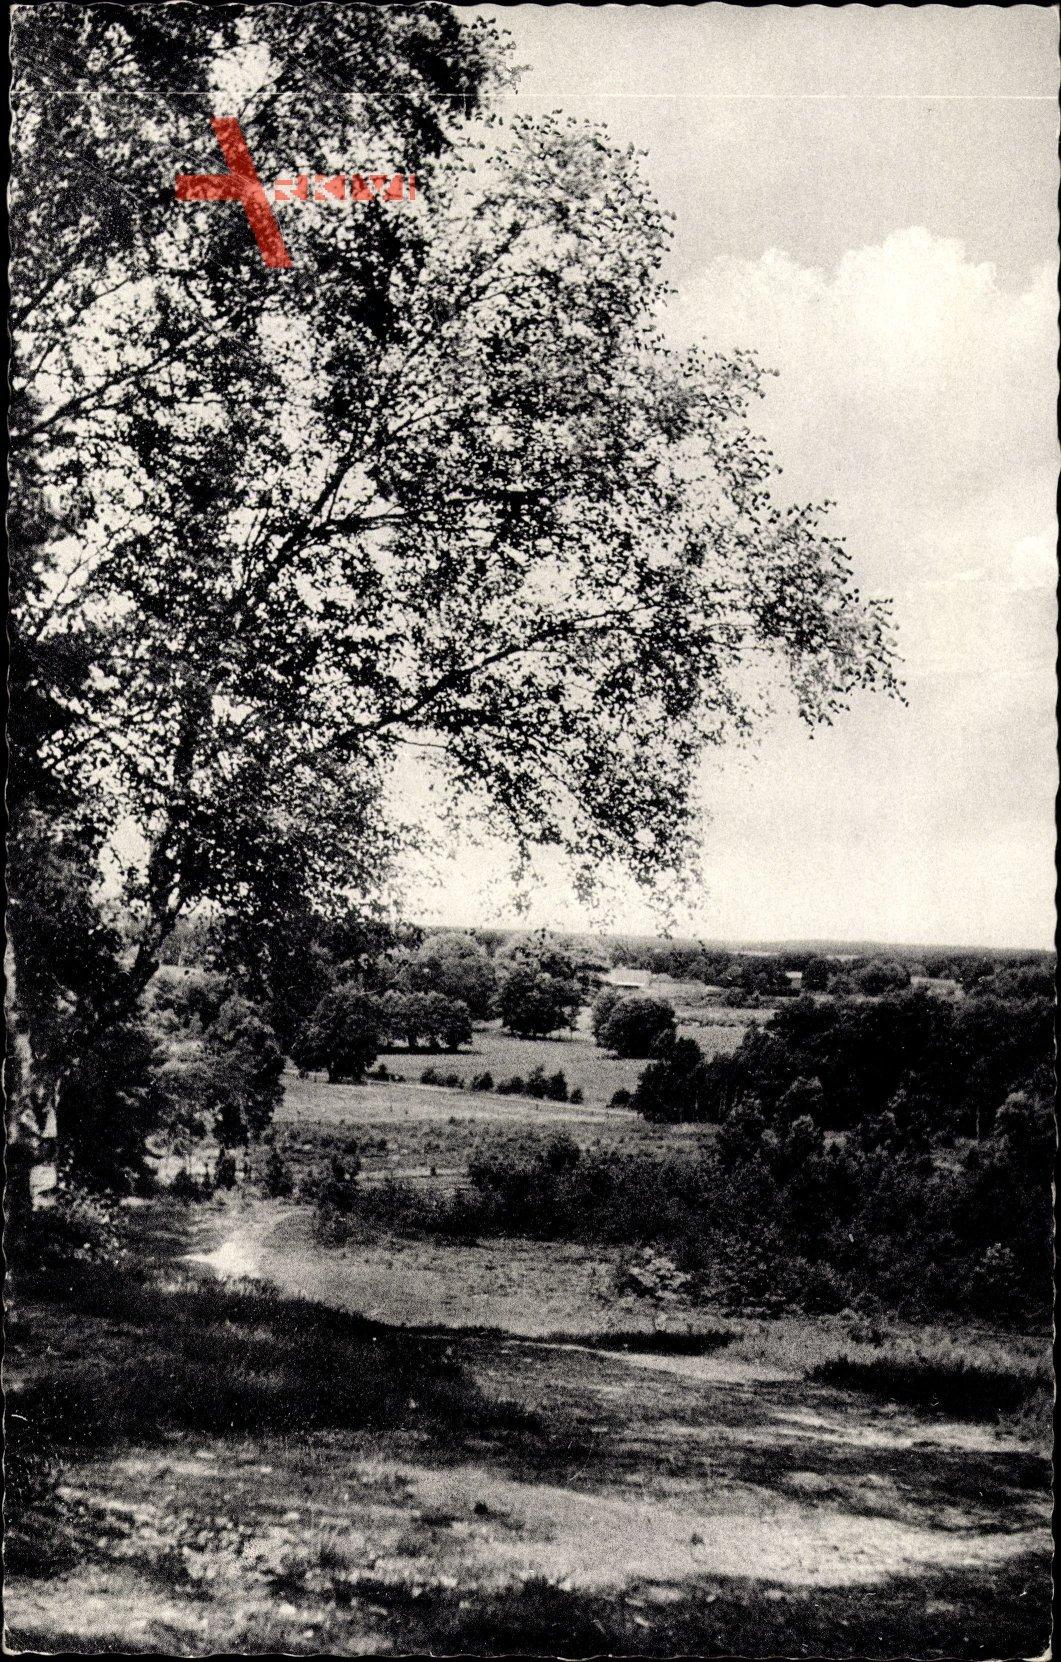 Hösseringen Suderburg Niedersachsen, Blick ins Hardautal, Lüneburger Heide